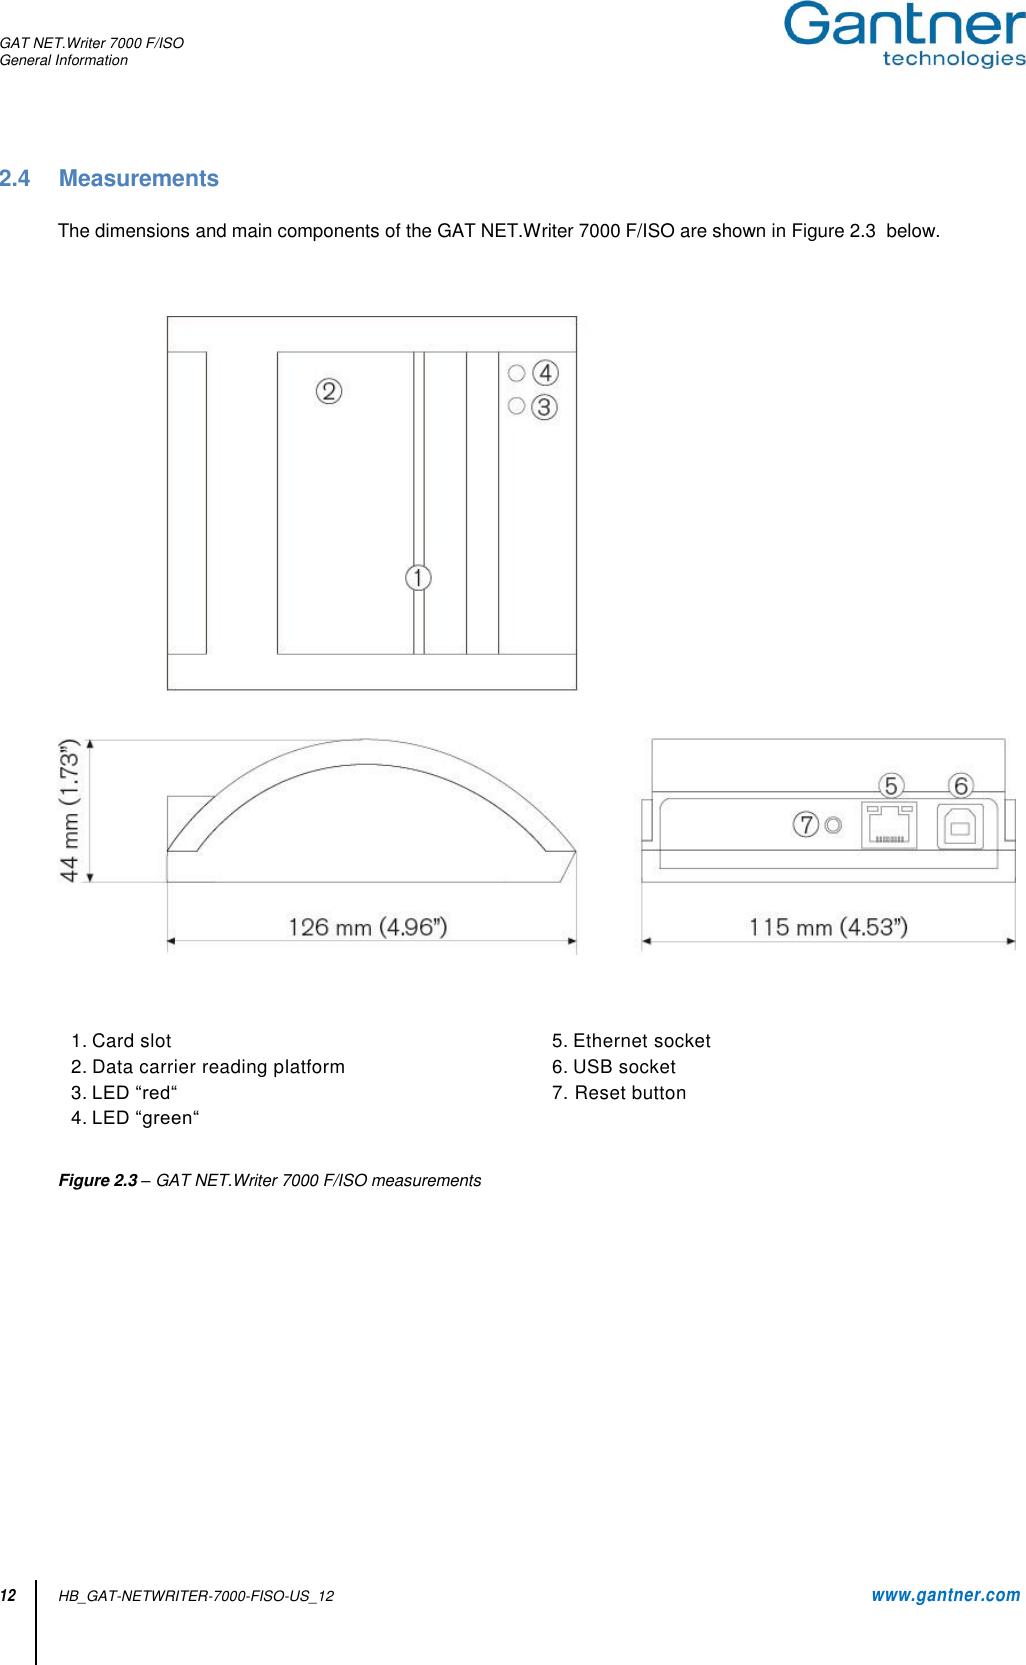 Gantner Electronic GEA1160018A GAT NET.Writer 7000 F/ISO